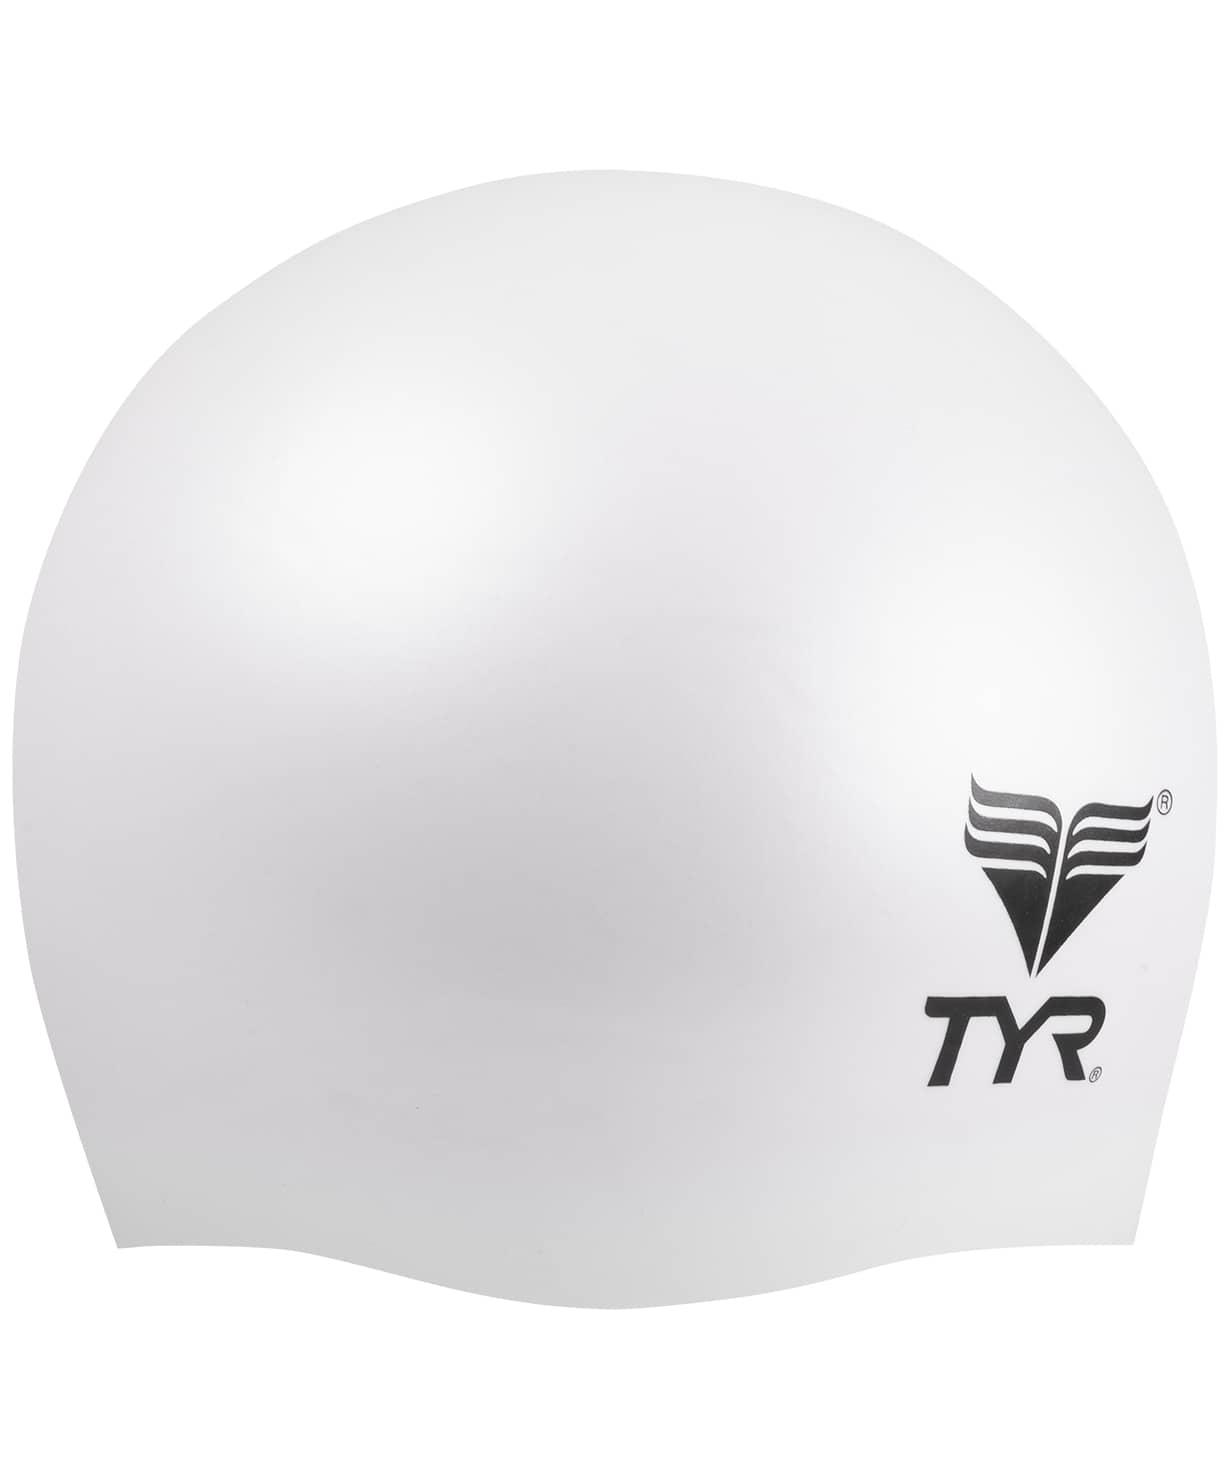 Шапочка плавательная Wrinkle Free Junior Silicone Cap, силикон, LCSJR/100, белый